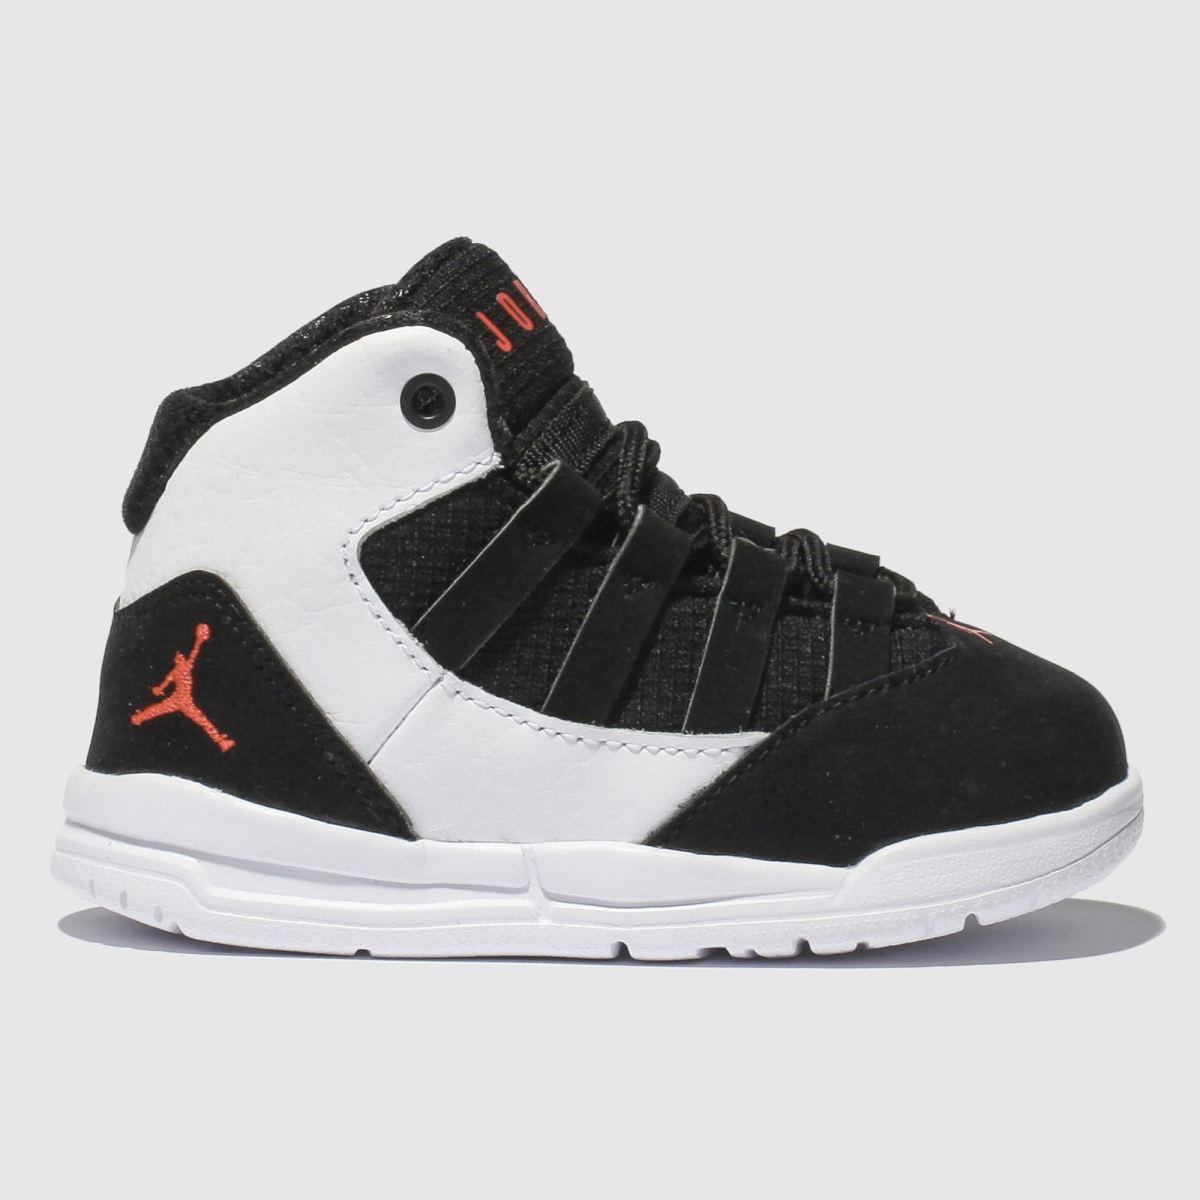 Nike Jordan White & Black Nike Jordan Max Aura Trainers Toddler